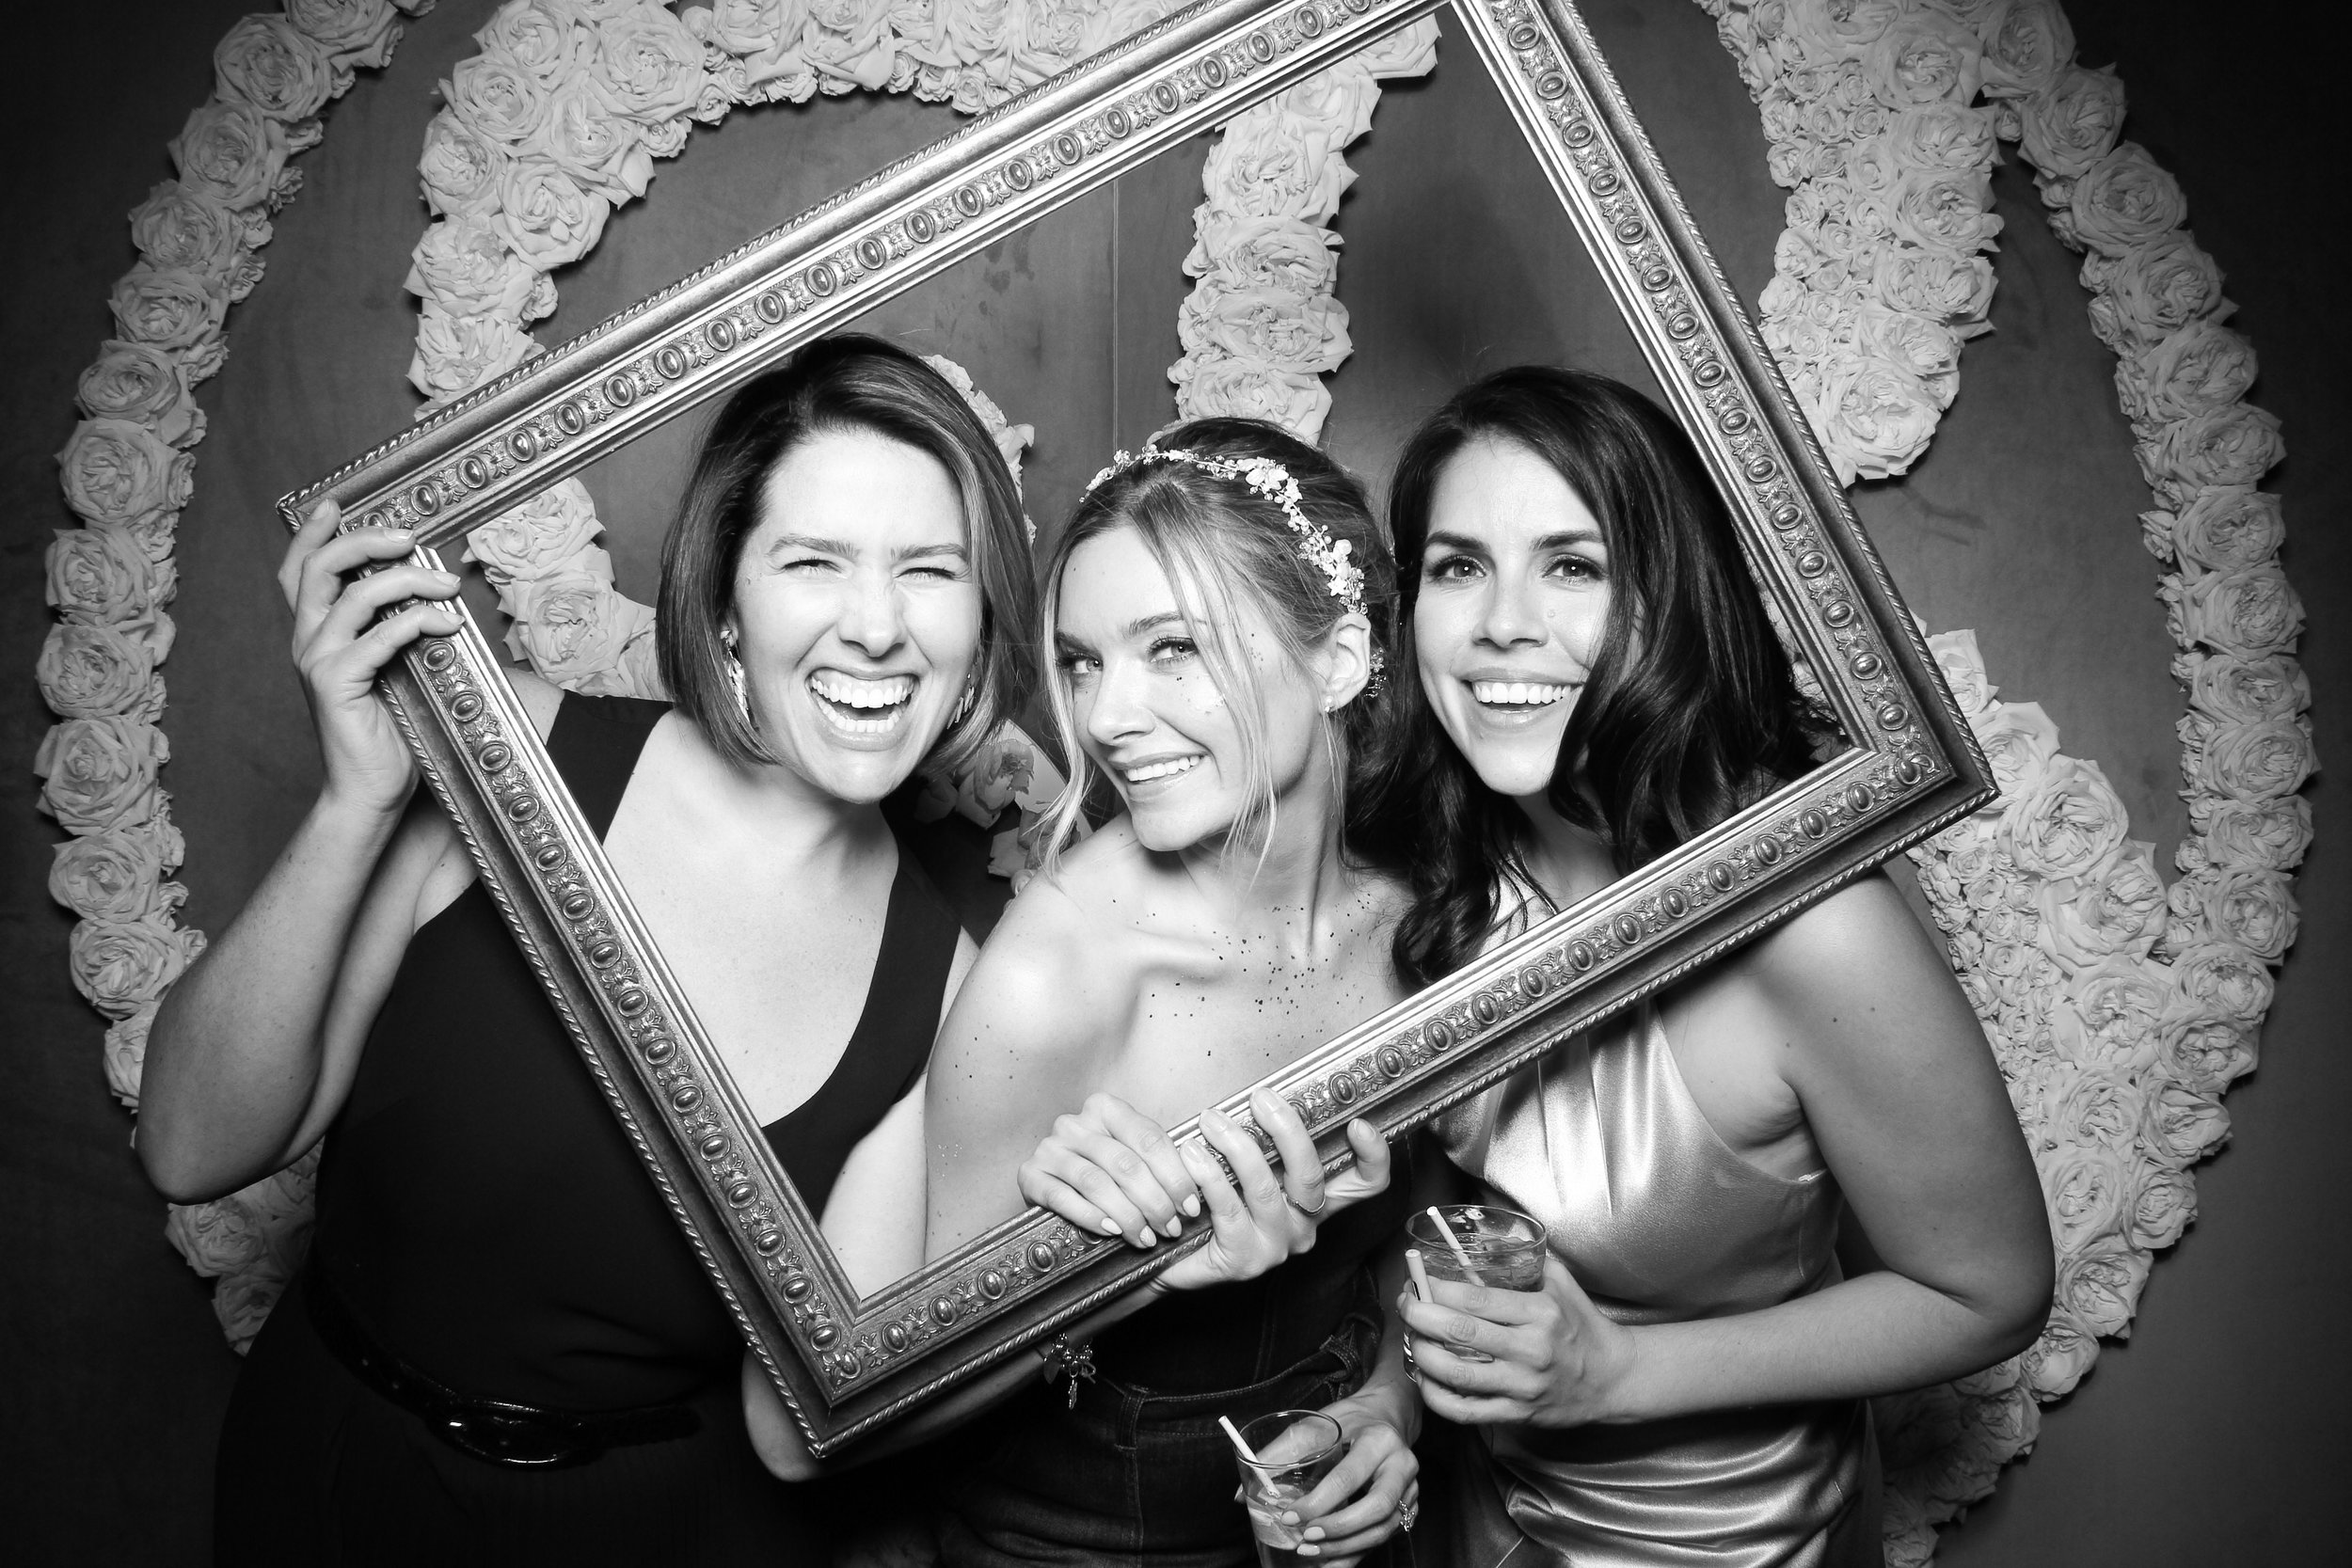 Photo_Booth_Rental_At_Standard_Club_Wedding_Chicago_25.jpg